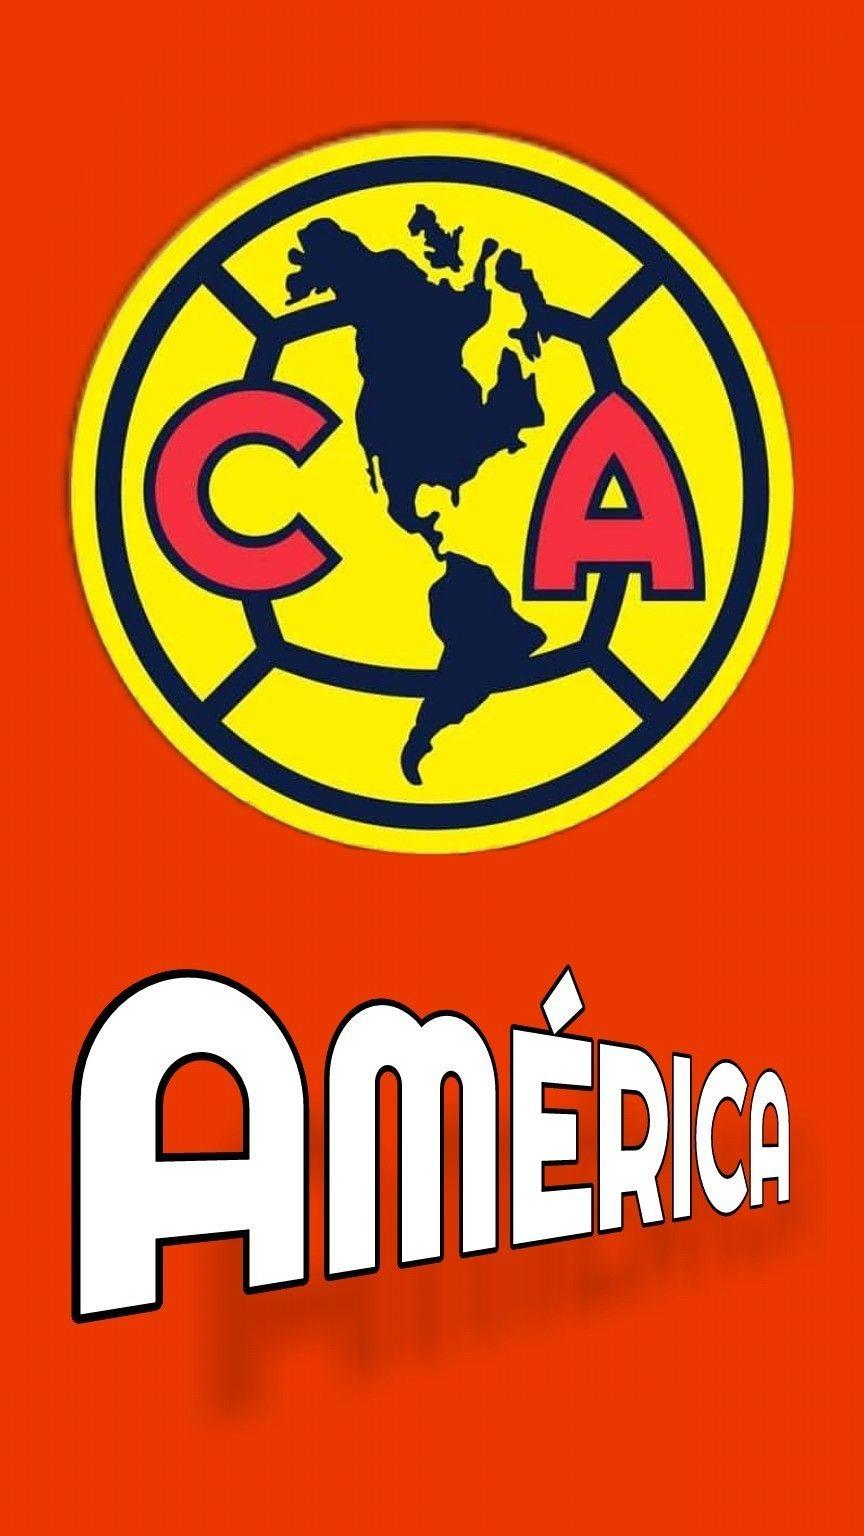 Pin De Vzqjf En Futbol Wallpaper En 2021 Club America Imagenes Del Equipo America Aguilas Del America